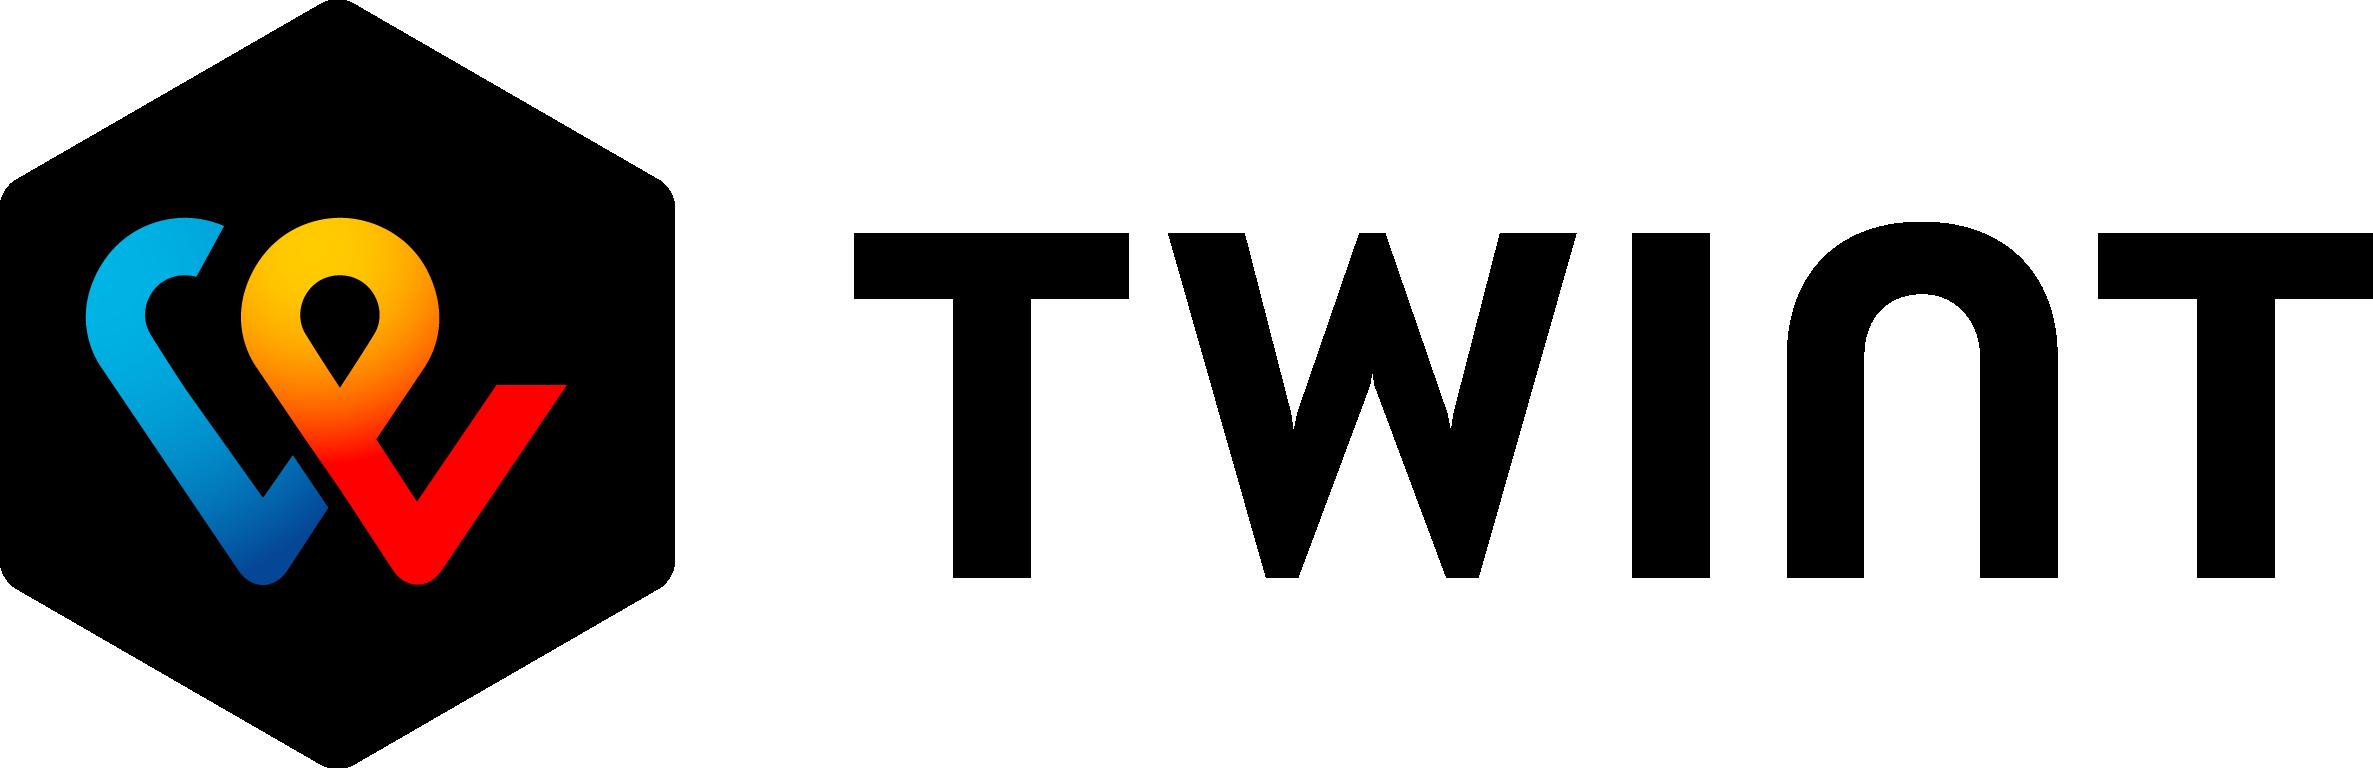 twint_logo_q_pos_rgb.png